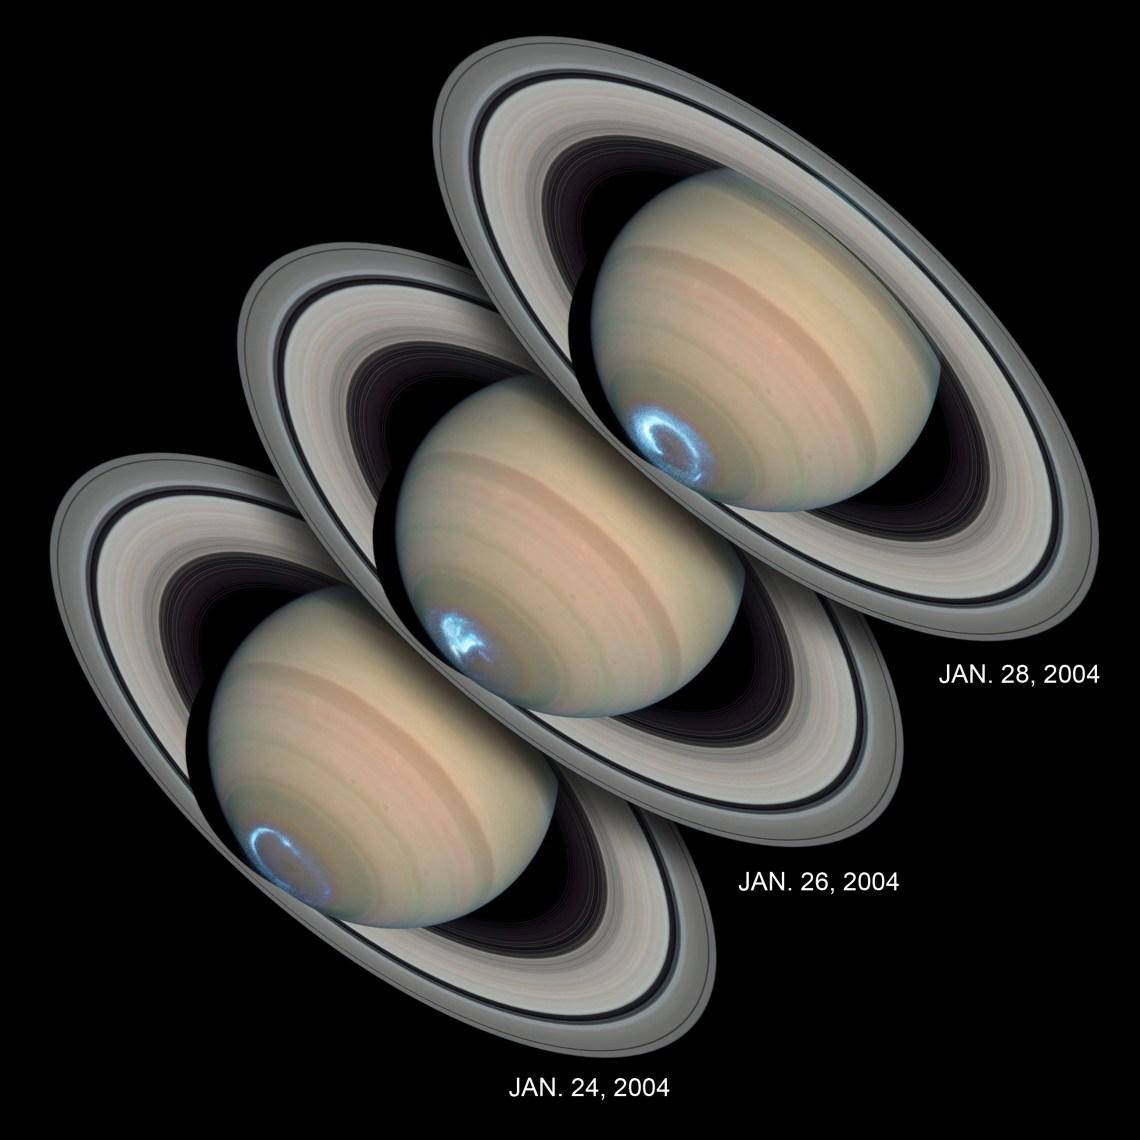 HUBBLE'S TOP 100 •#90 •Credit: NASA, ESA, J. Clarke (Boston University, USA), and Z. Levay (STScI)